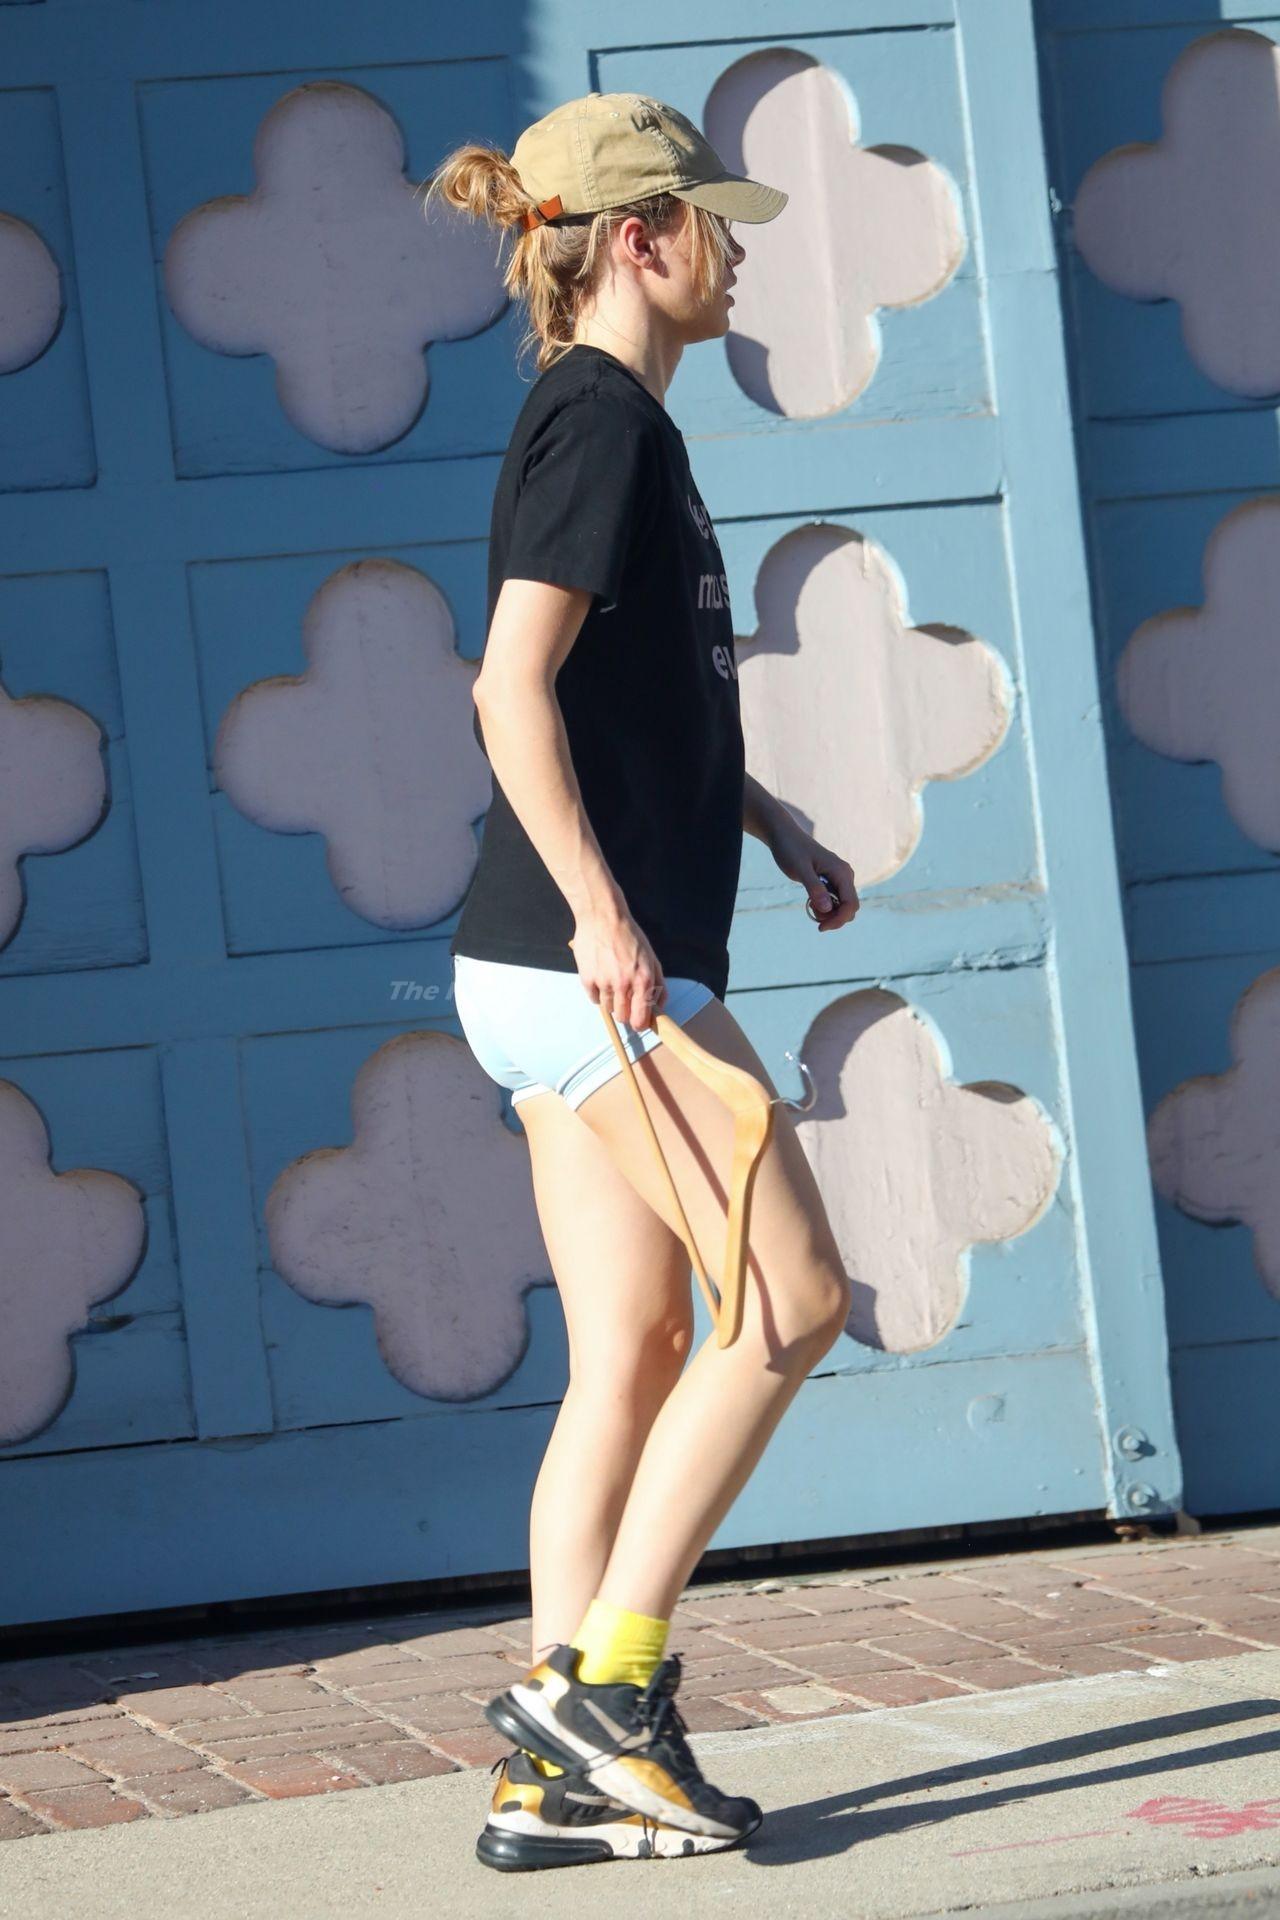 Suki-Waterhouse-Sexy-The-Fappening-Blog-55.jpg